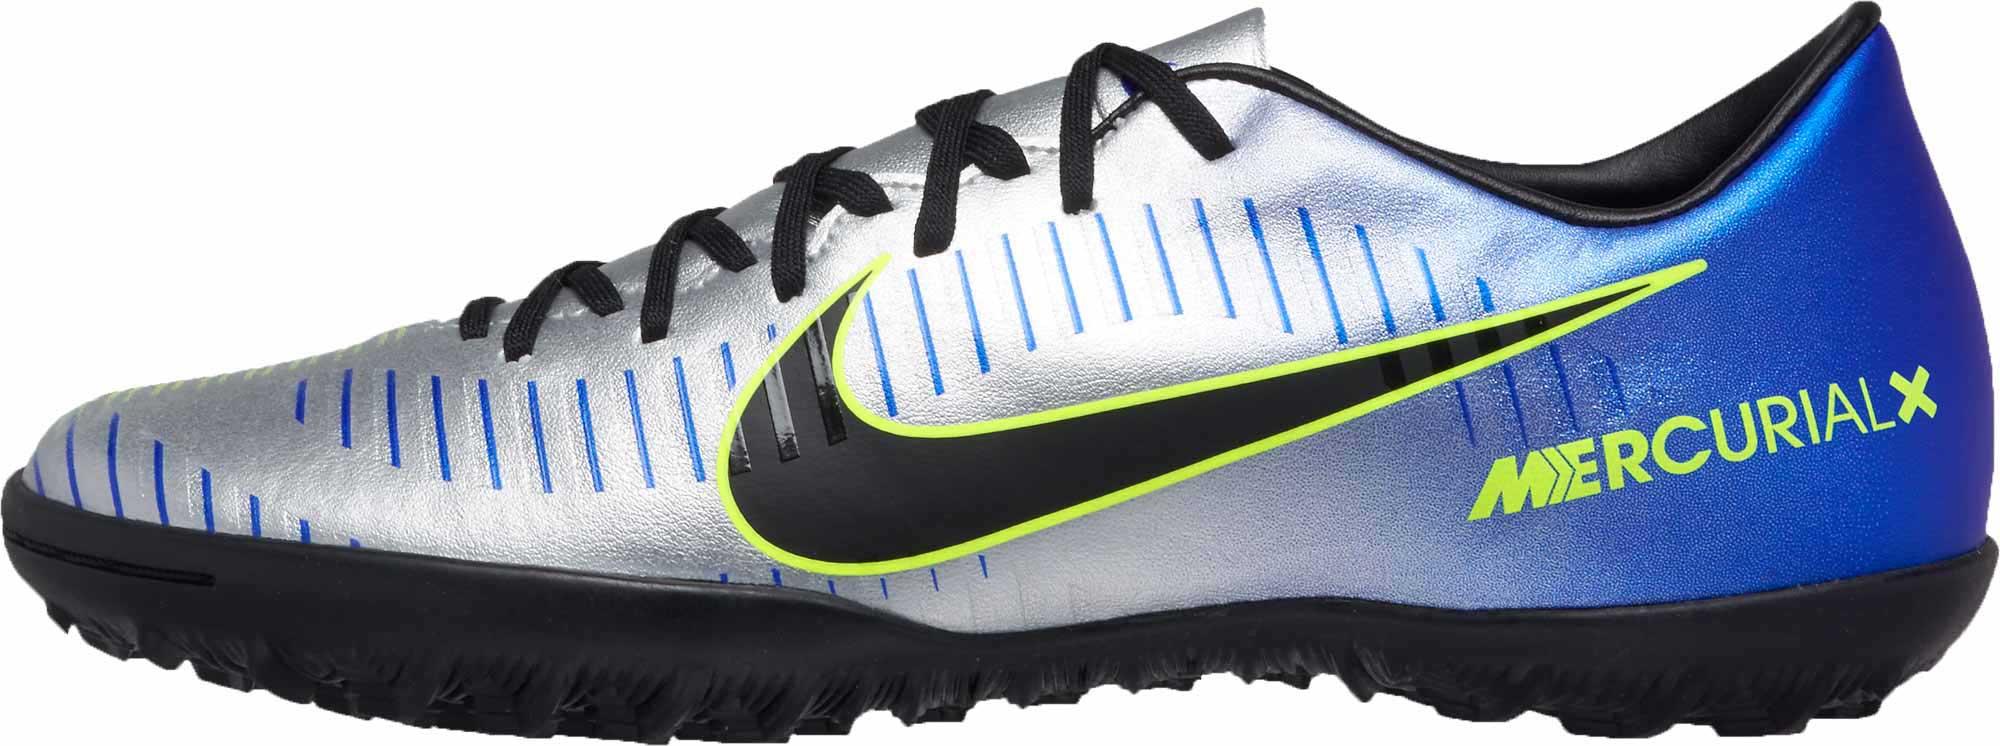 buy online 9cfd5 f9fc6 Nike MercurialX Victory VI TF – Neymar Jr – Racer Blue Chrome